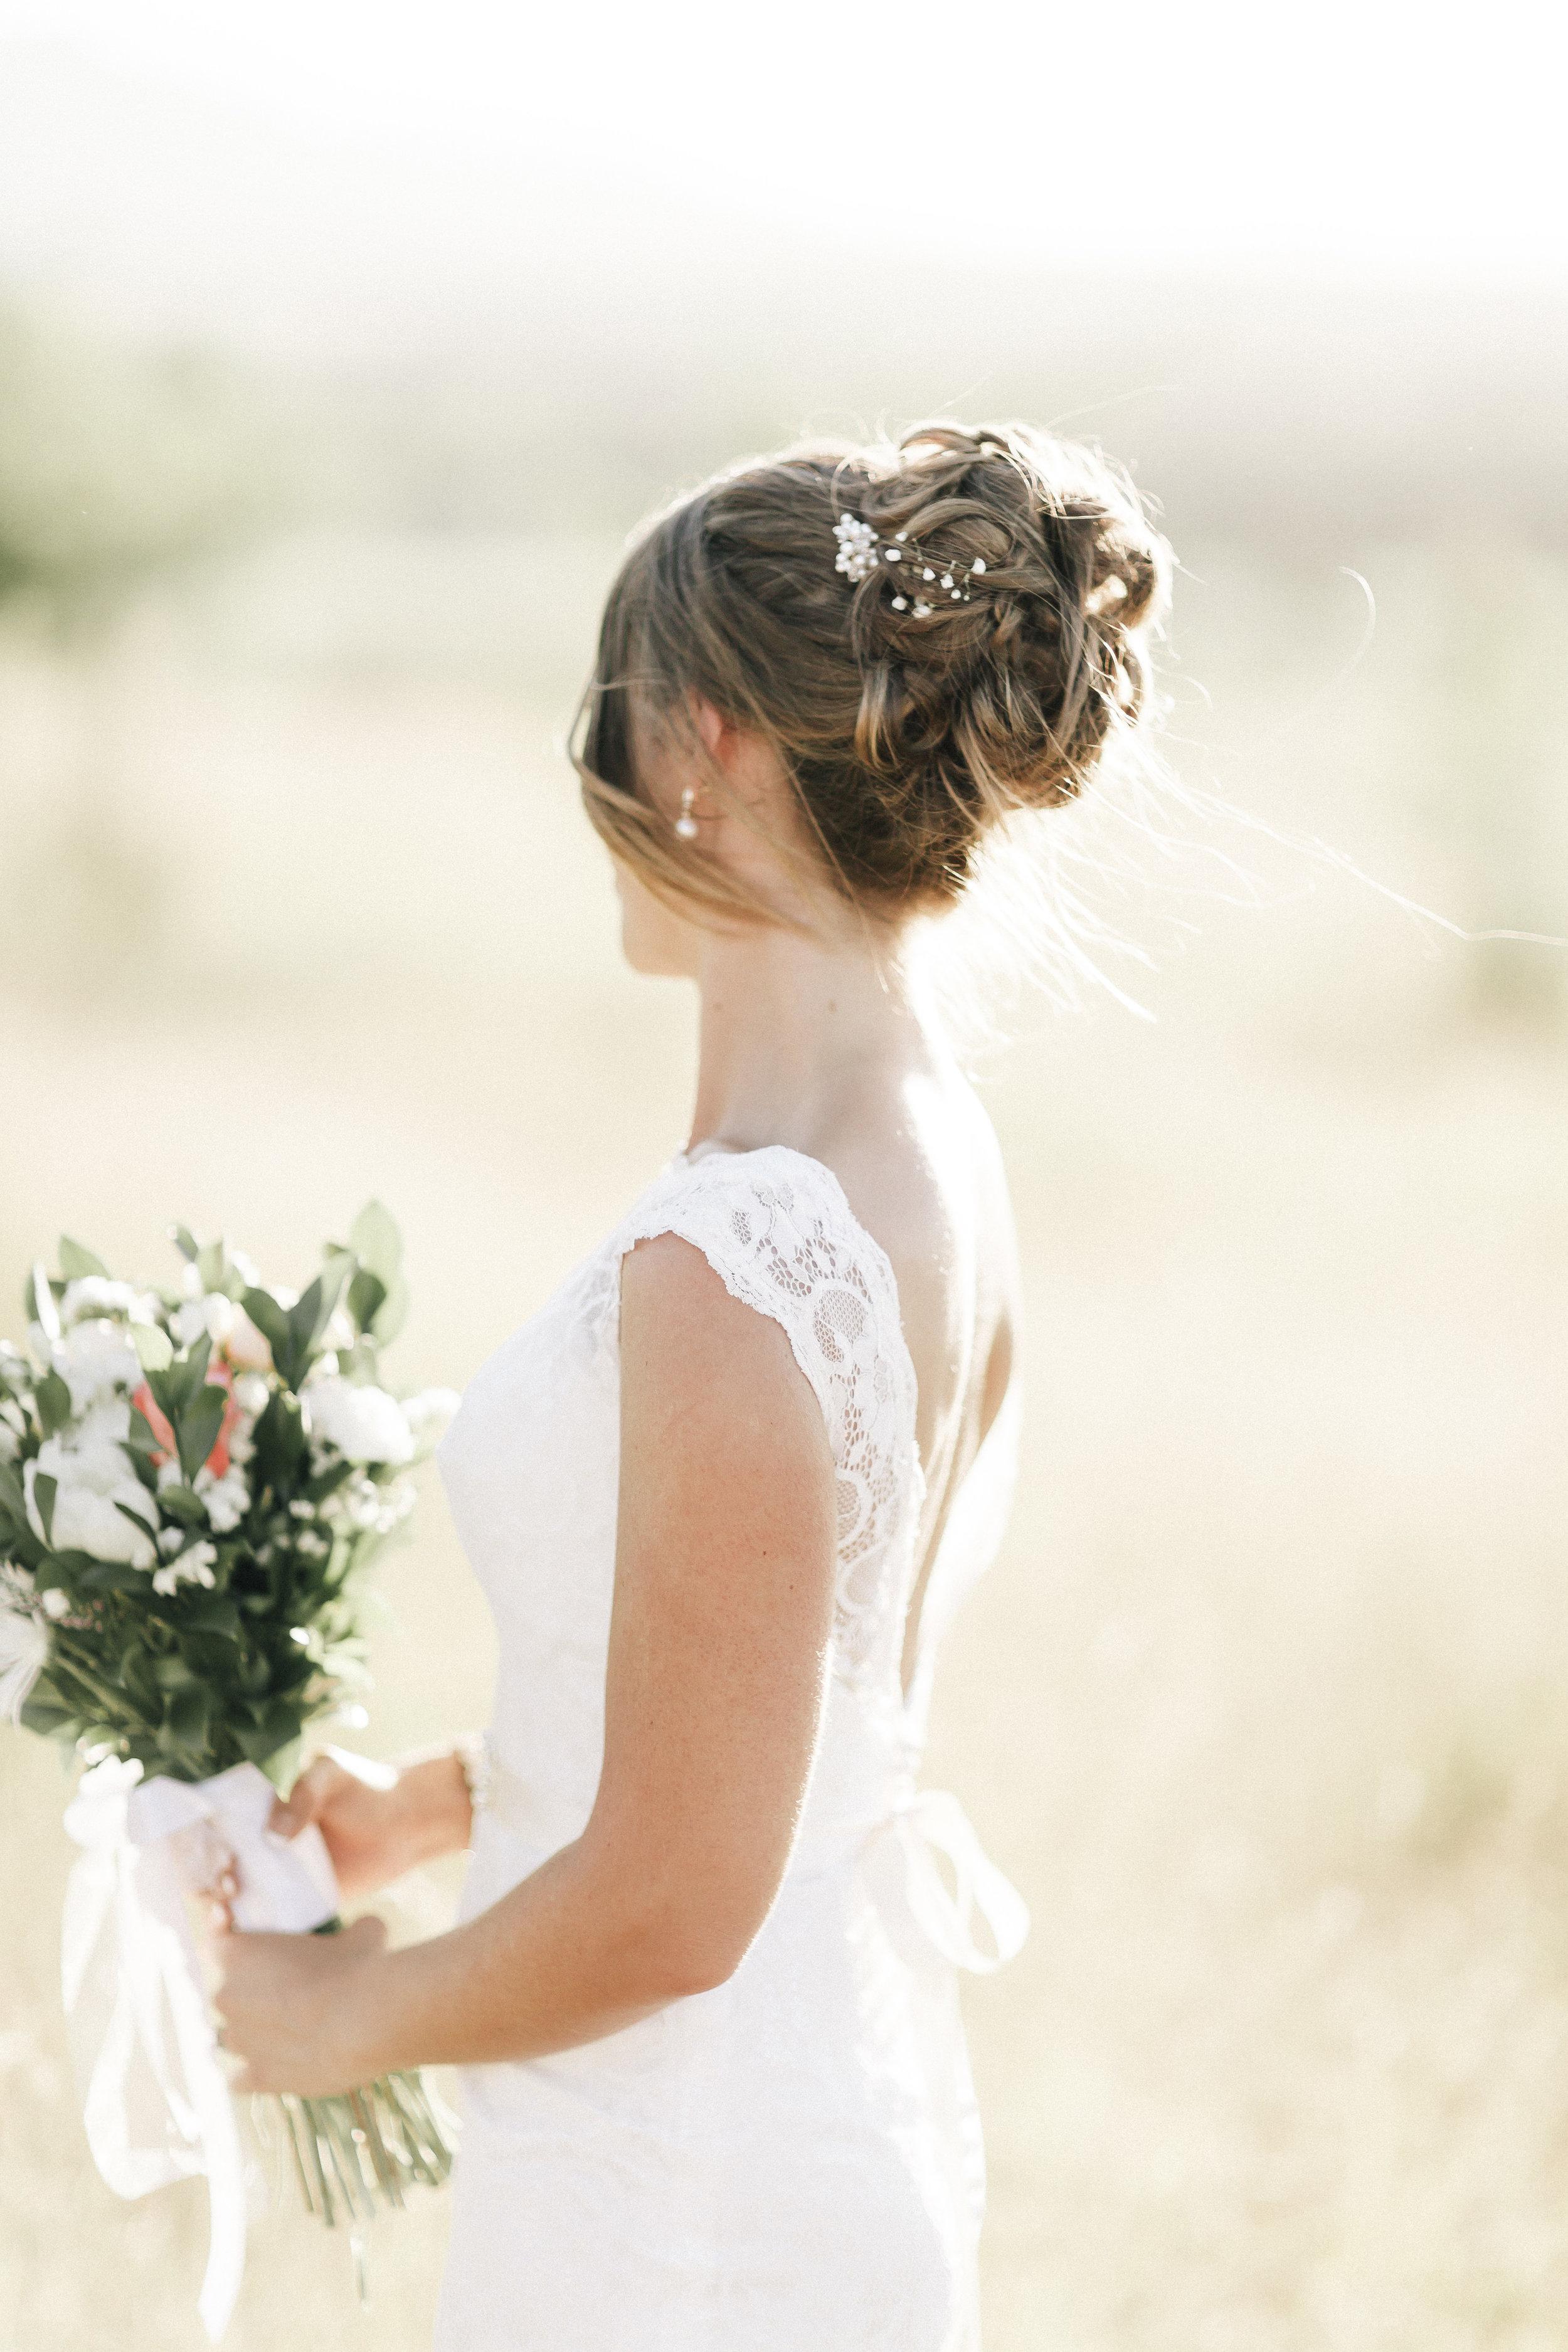 WeddingPhotos_HighResolution-1549.jpg